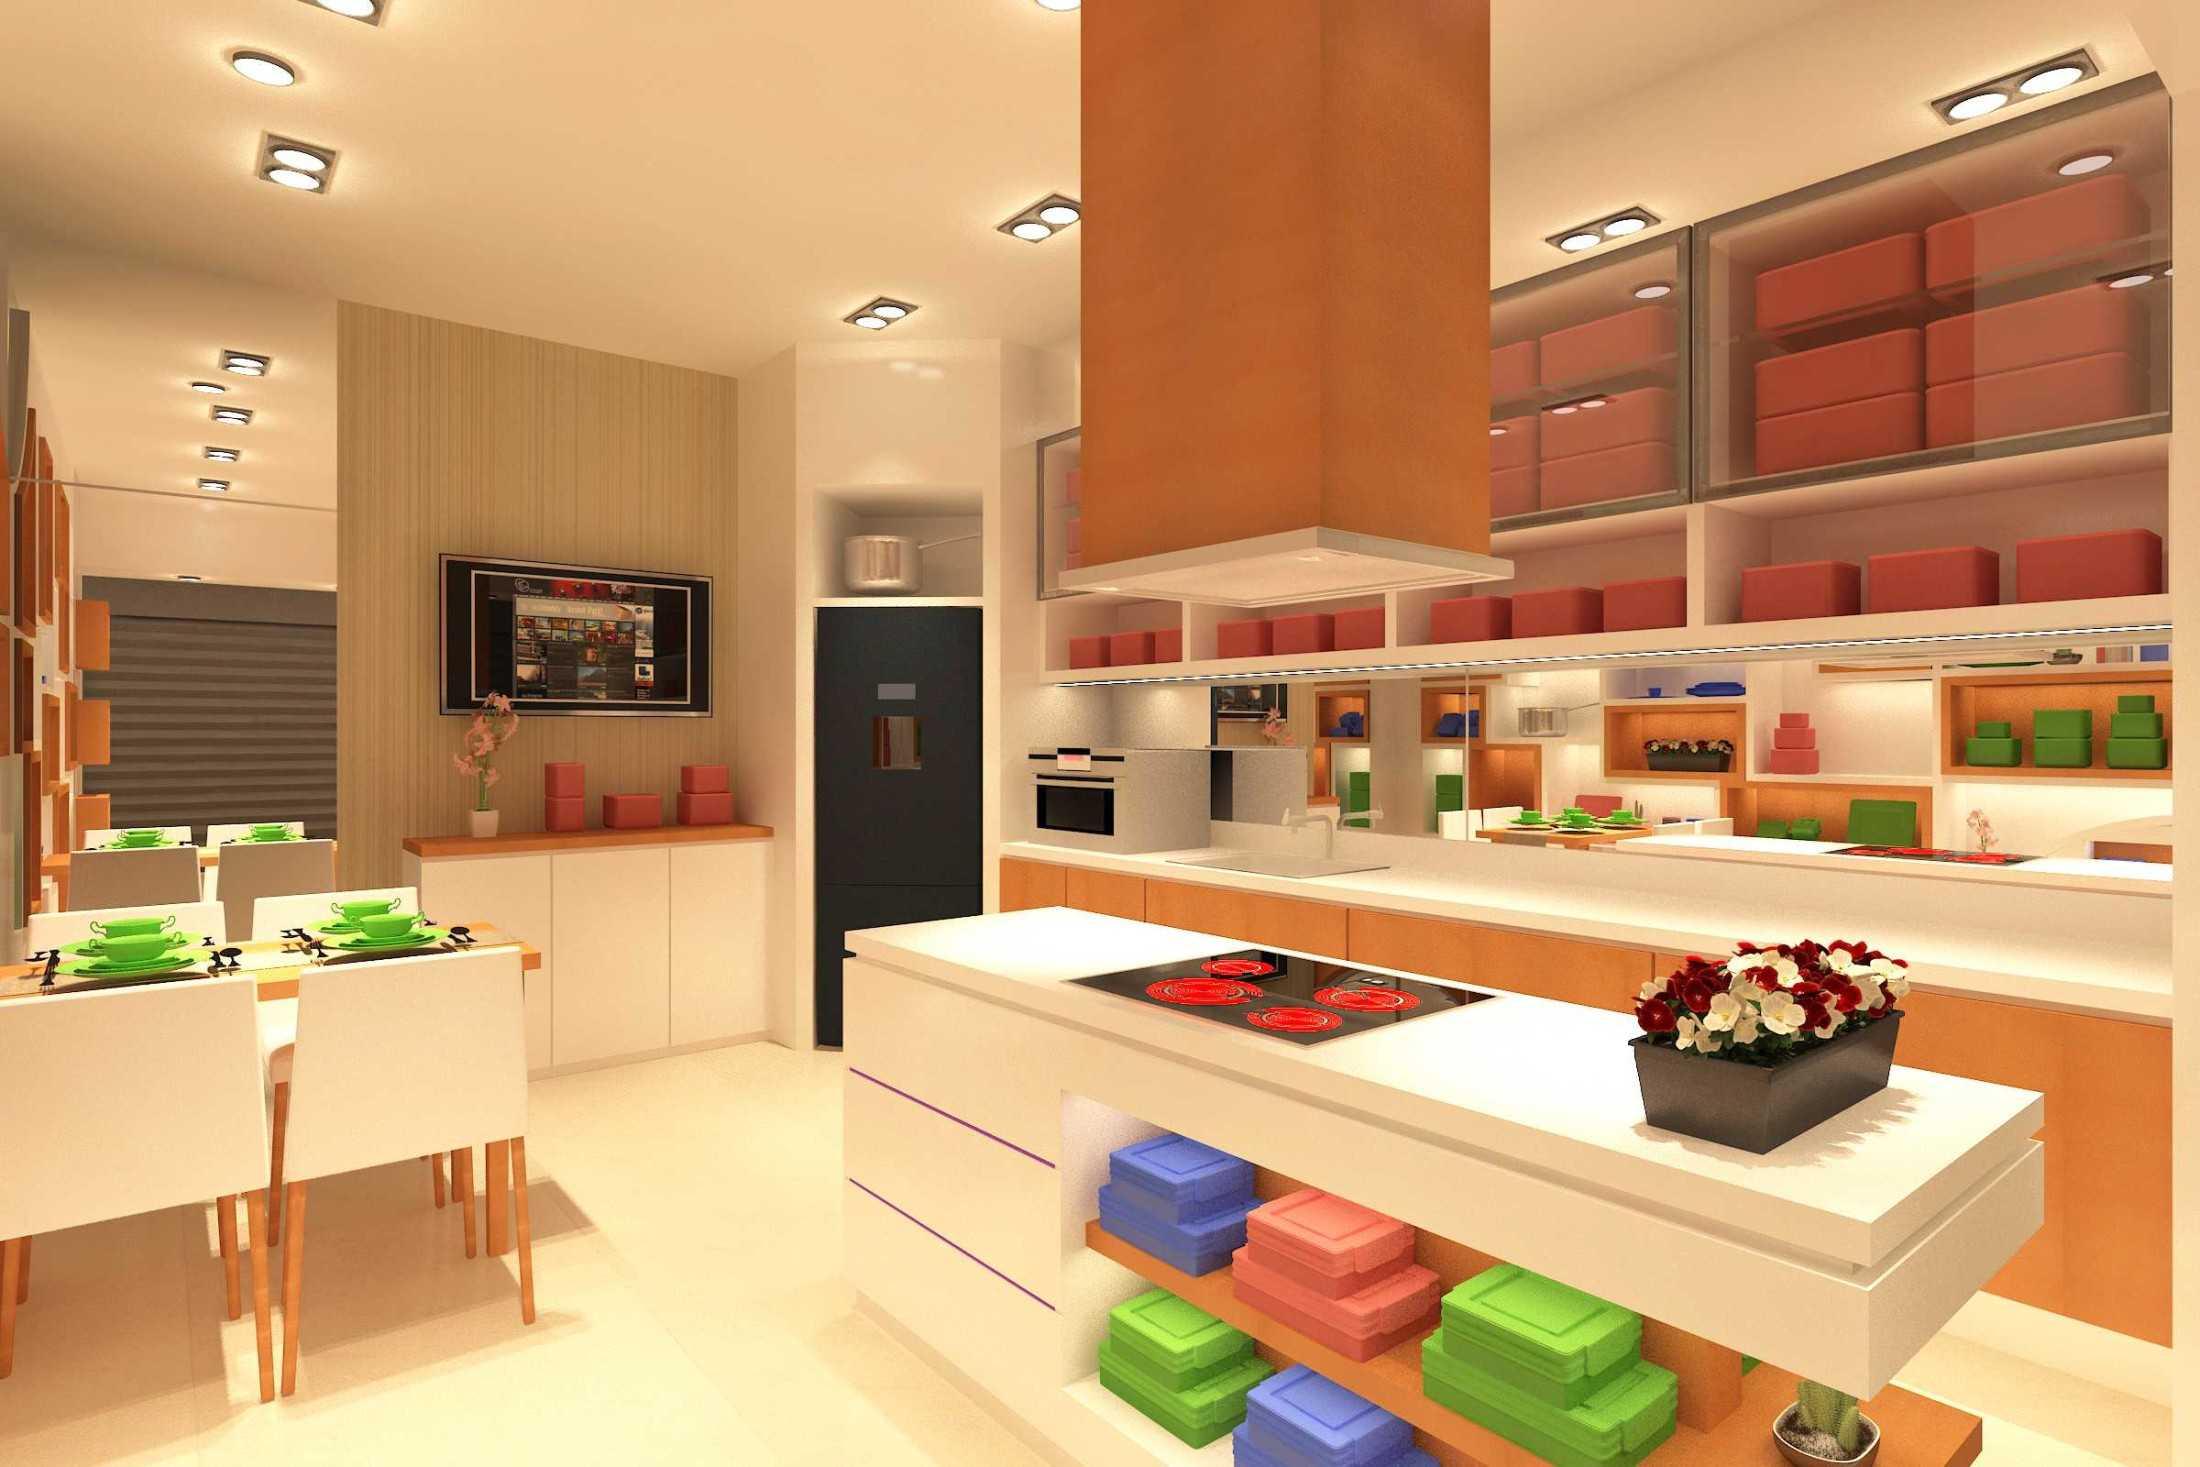 Cds Studio Tupperware Studio - Pondok Indah Mall Jakarta, Daerah Khusus Ibukota Jakarta, Indonesia Jakarta, Daerah Khusus Ibukota Jakarta, Indonesia Cds-Studio-Tupperware-Studio-Pondok-Indah-Mall  76176